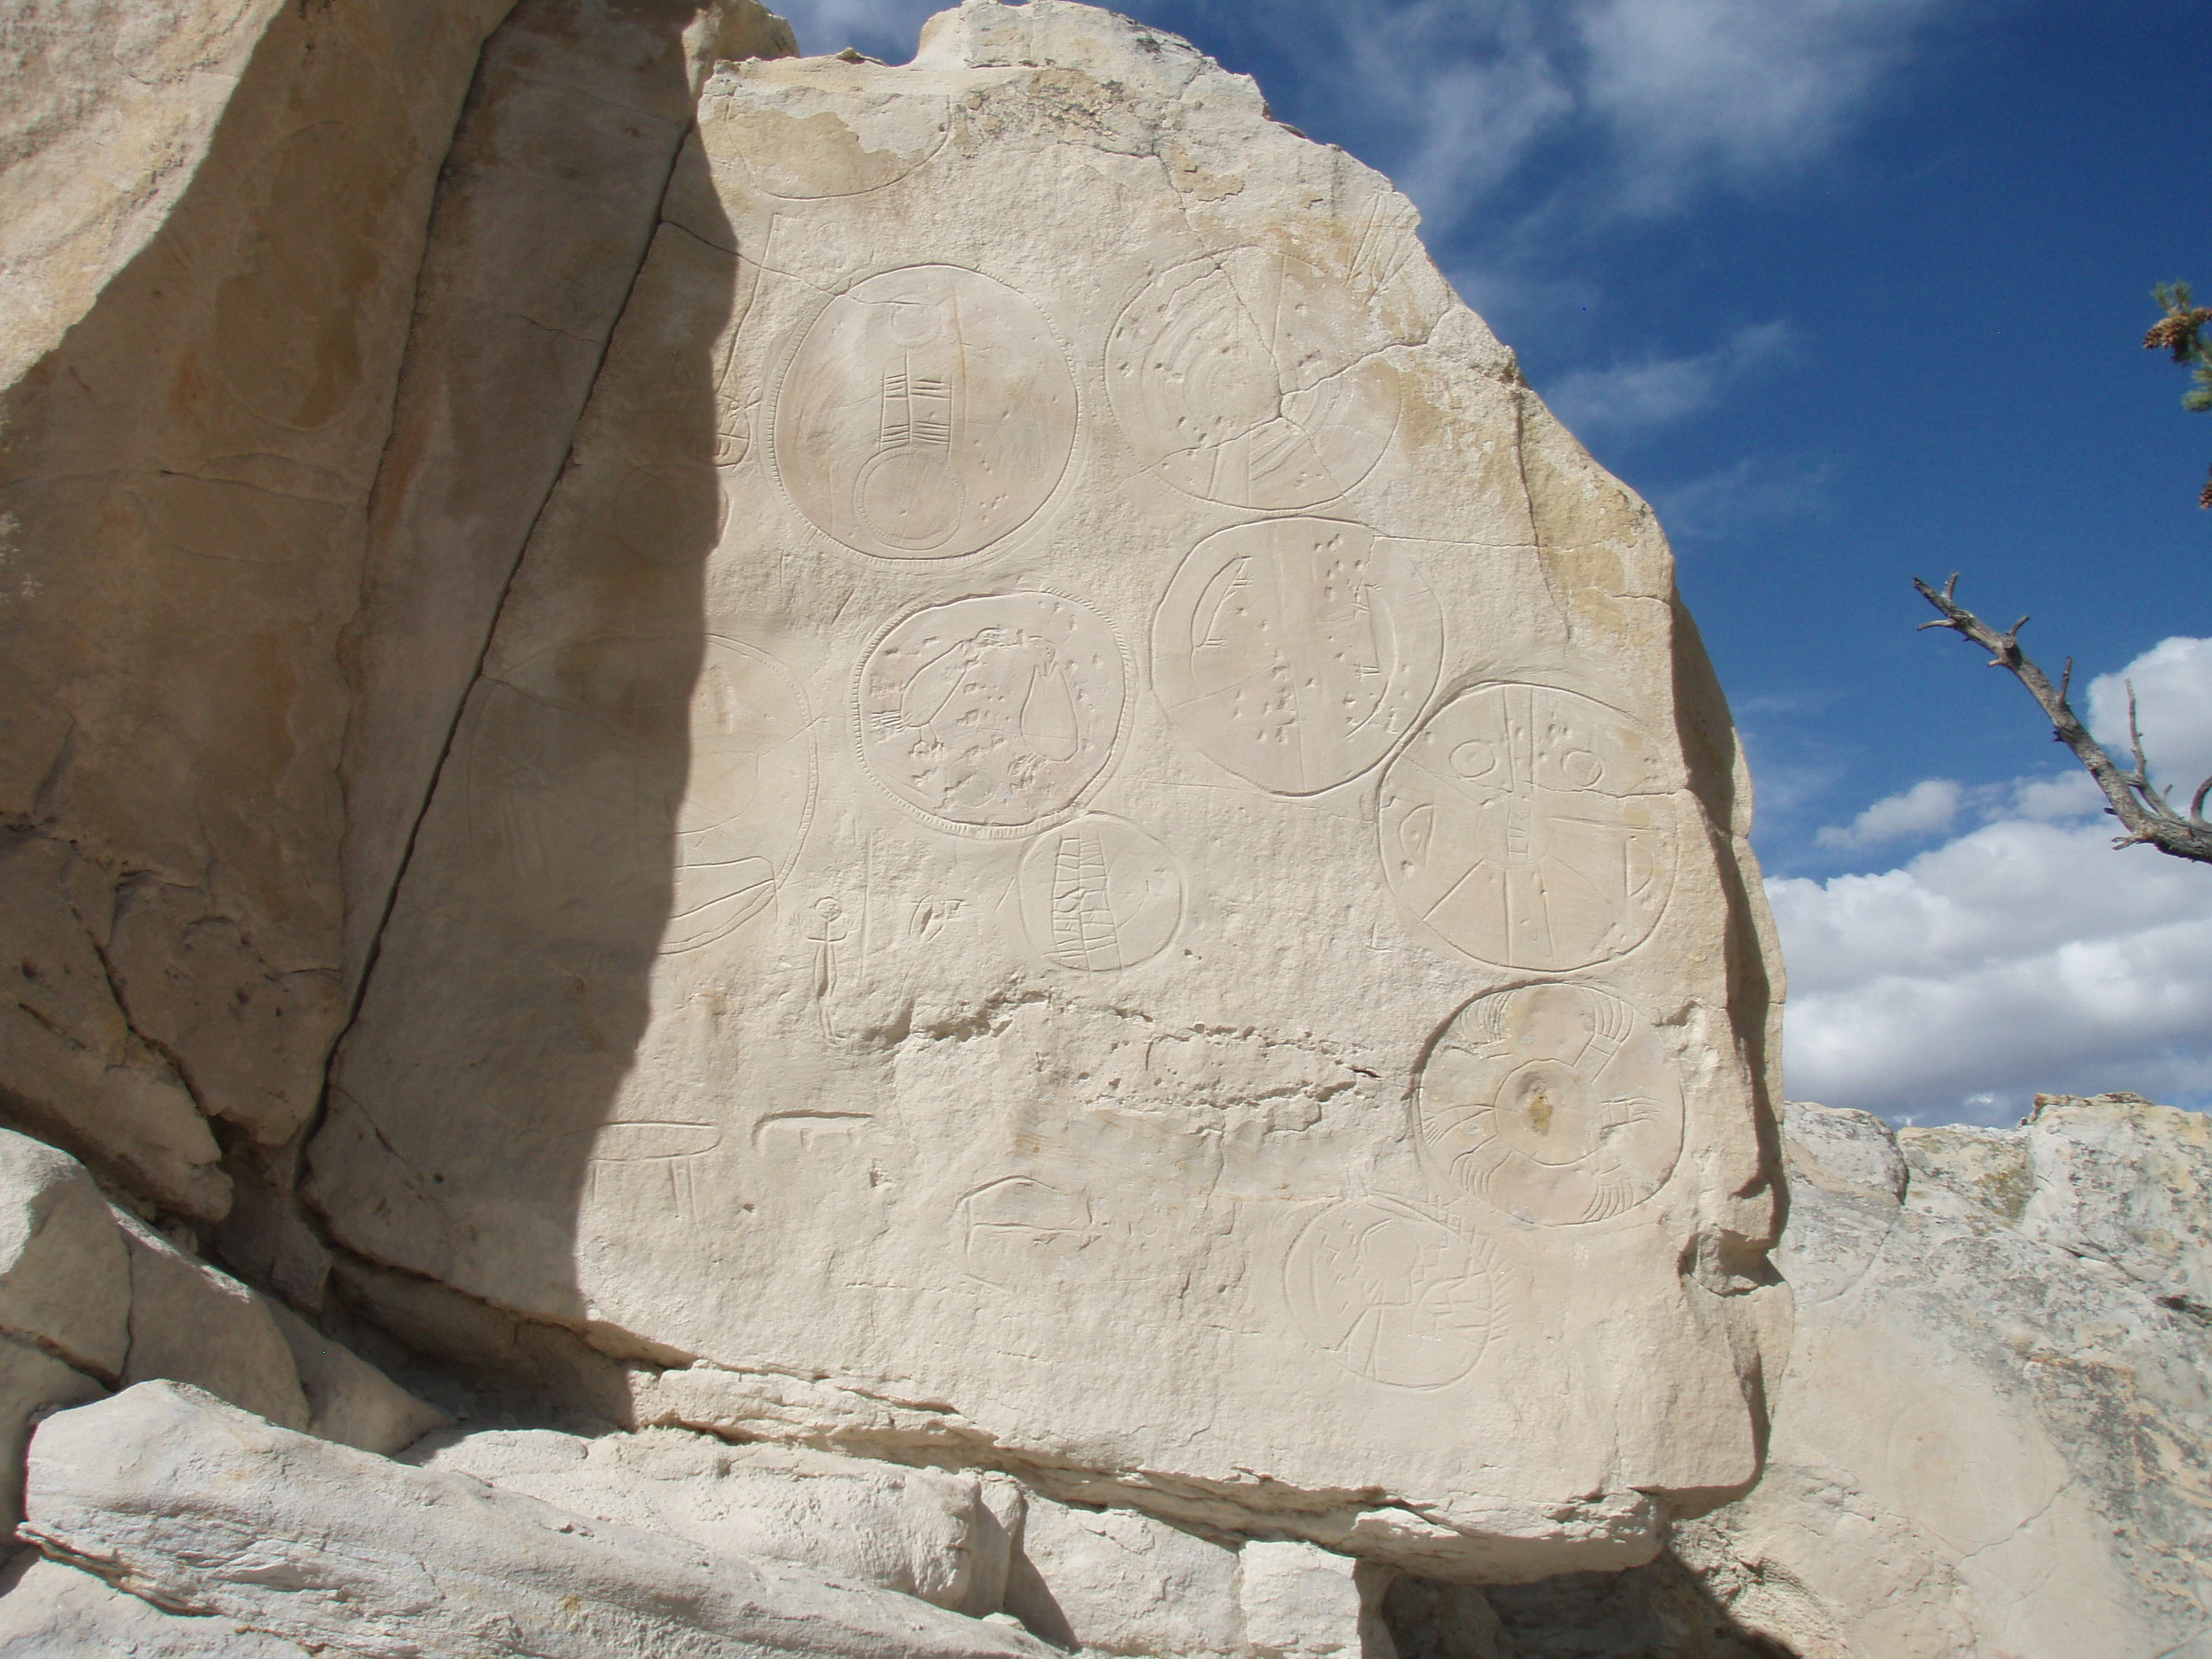 Shields petroglyphs at Castle Gardens